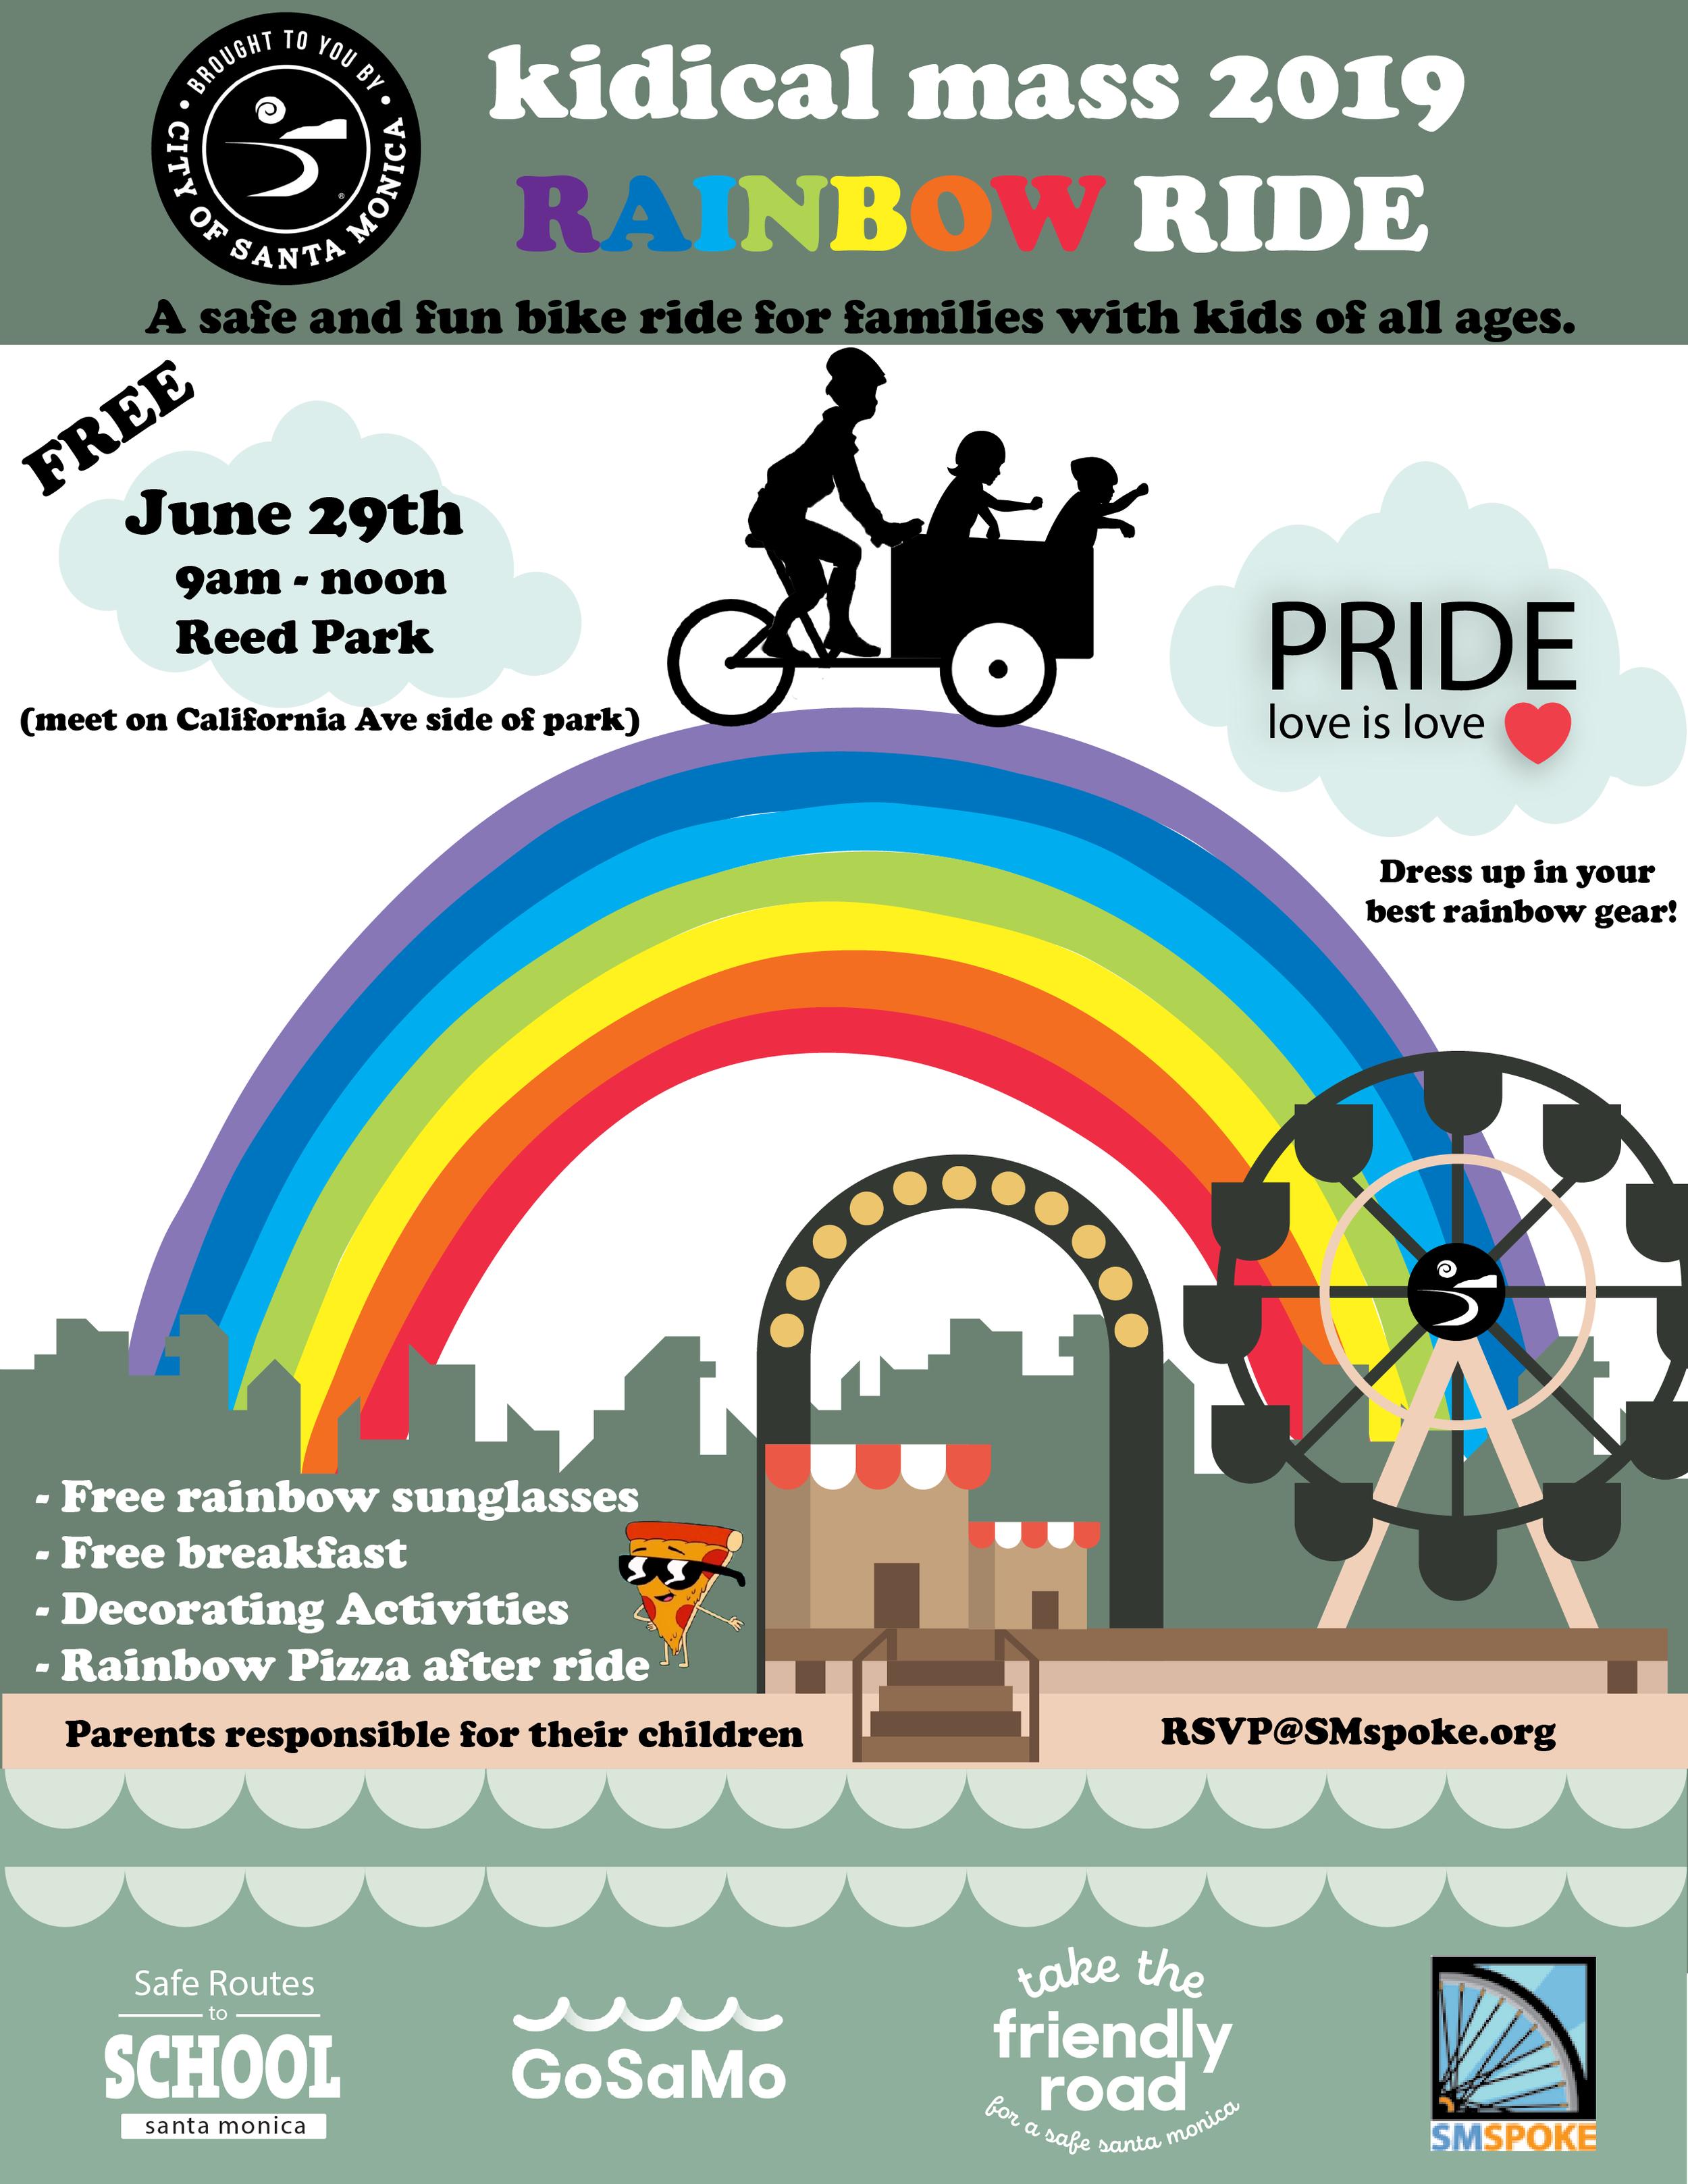 pride_ride_2019-01.png